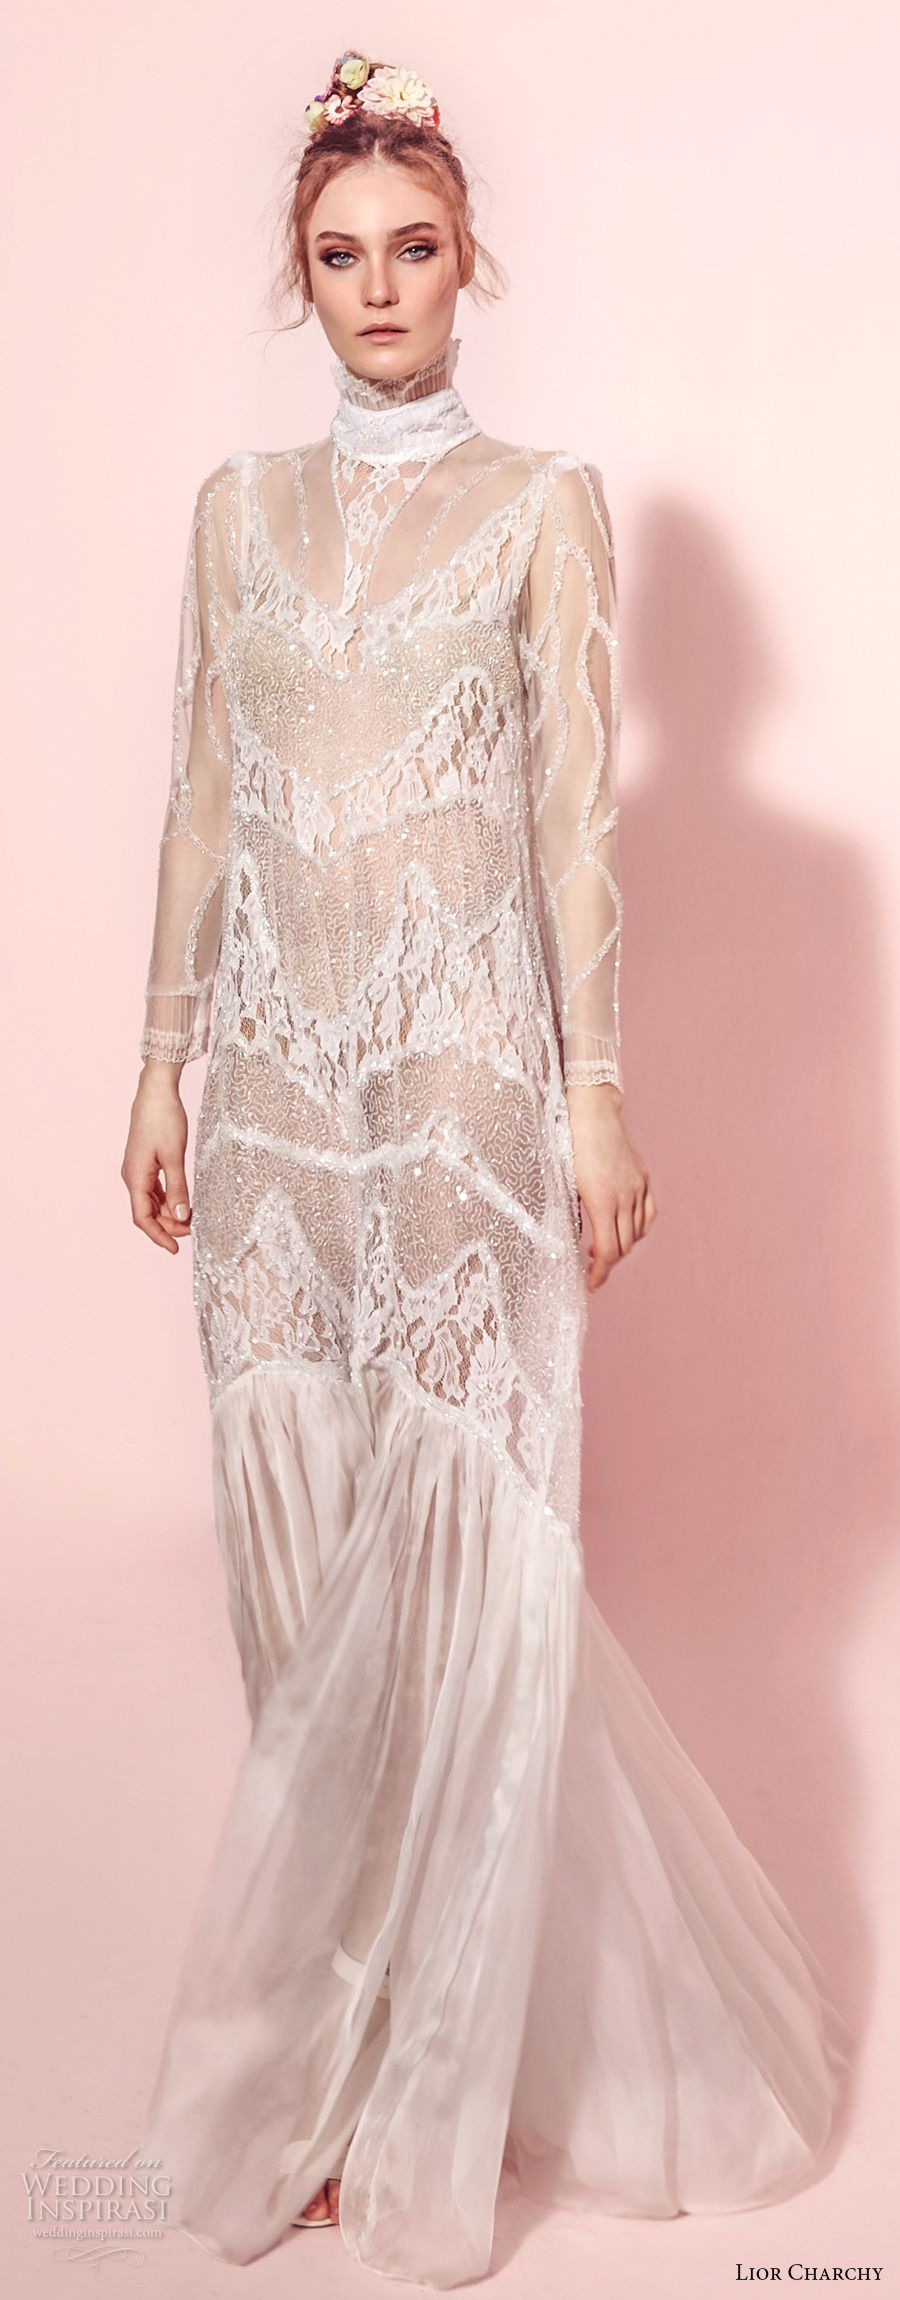 Lior Charchy Spring 2017 Wedding Dresses   Pinterest   Vestidos de ...